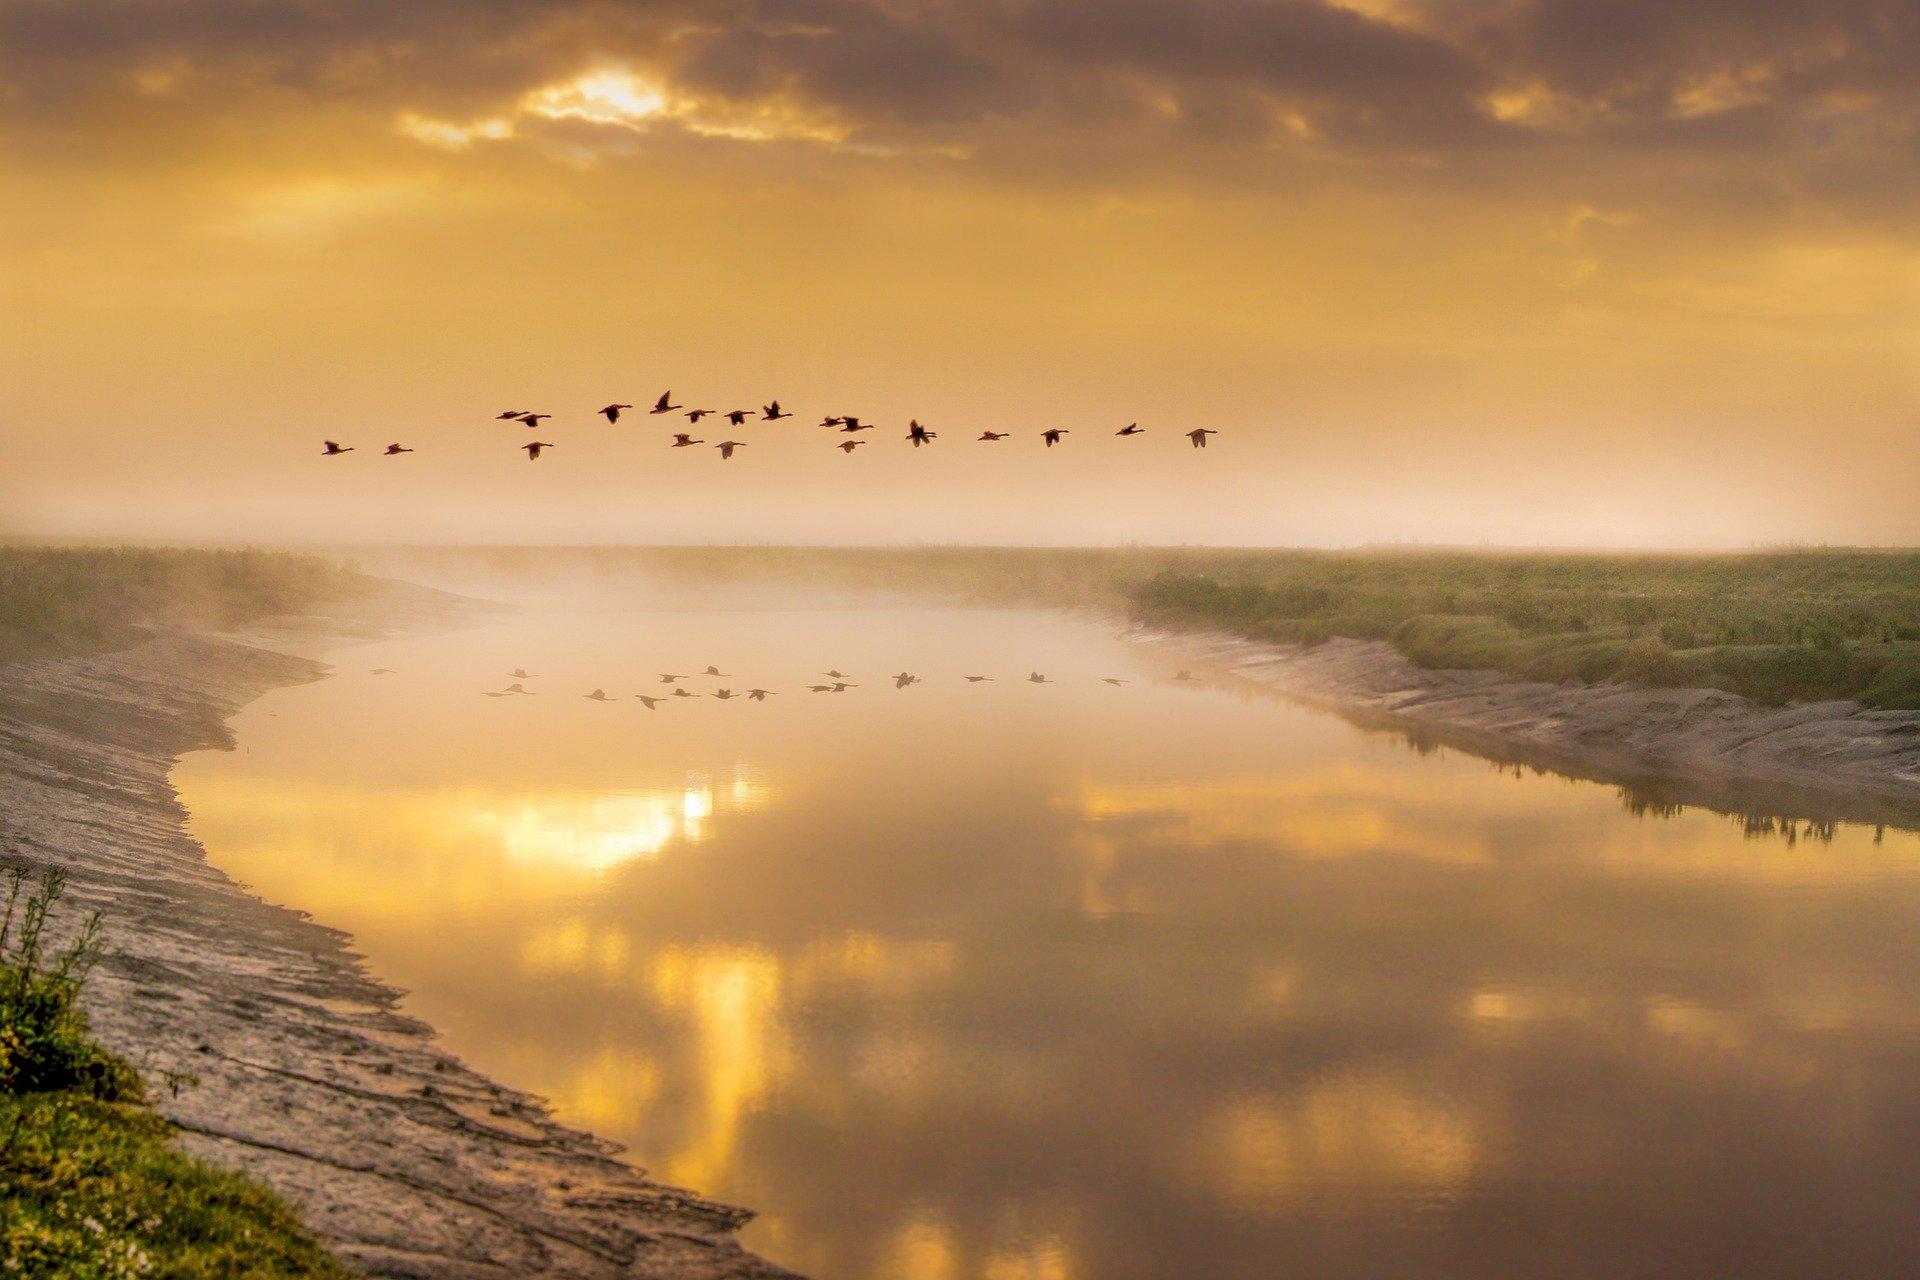 Vögel am Himmel